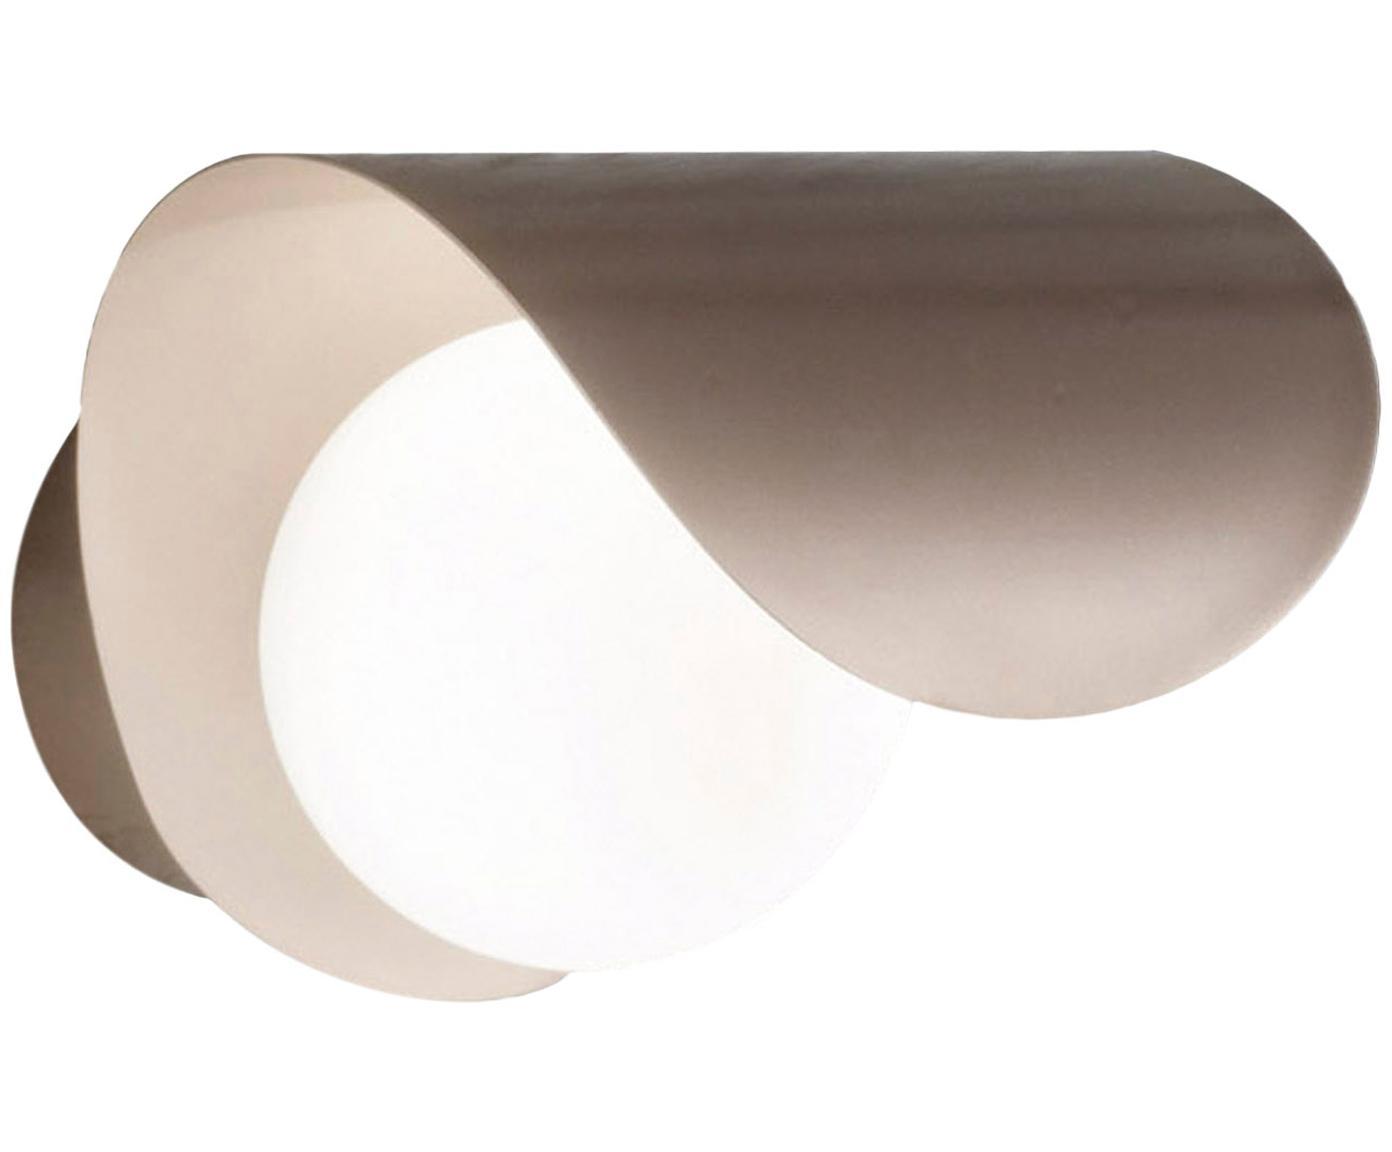 Aplique Adria, Anclaje: metal, pintado, Pantalla: vidrio opalino, Dorado, blanco opalino, An 16 x Al 18 cm